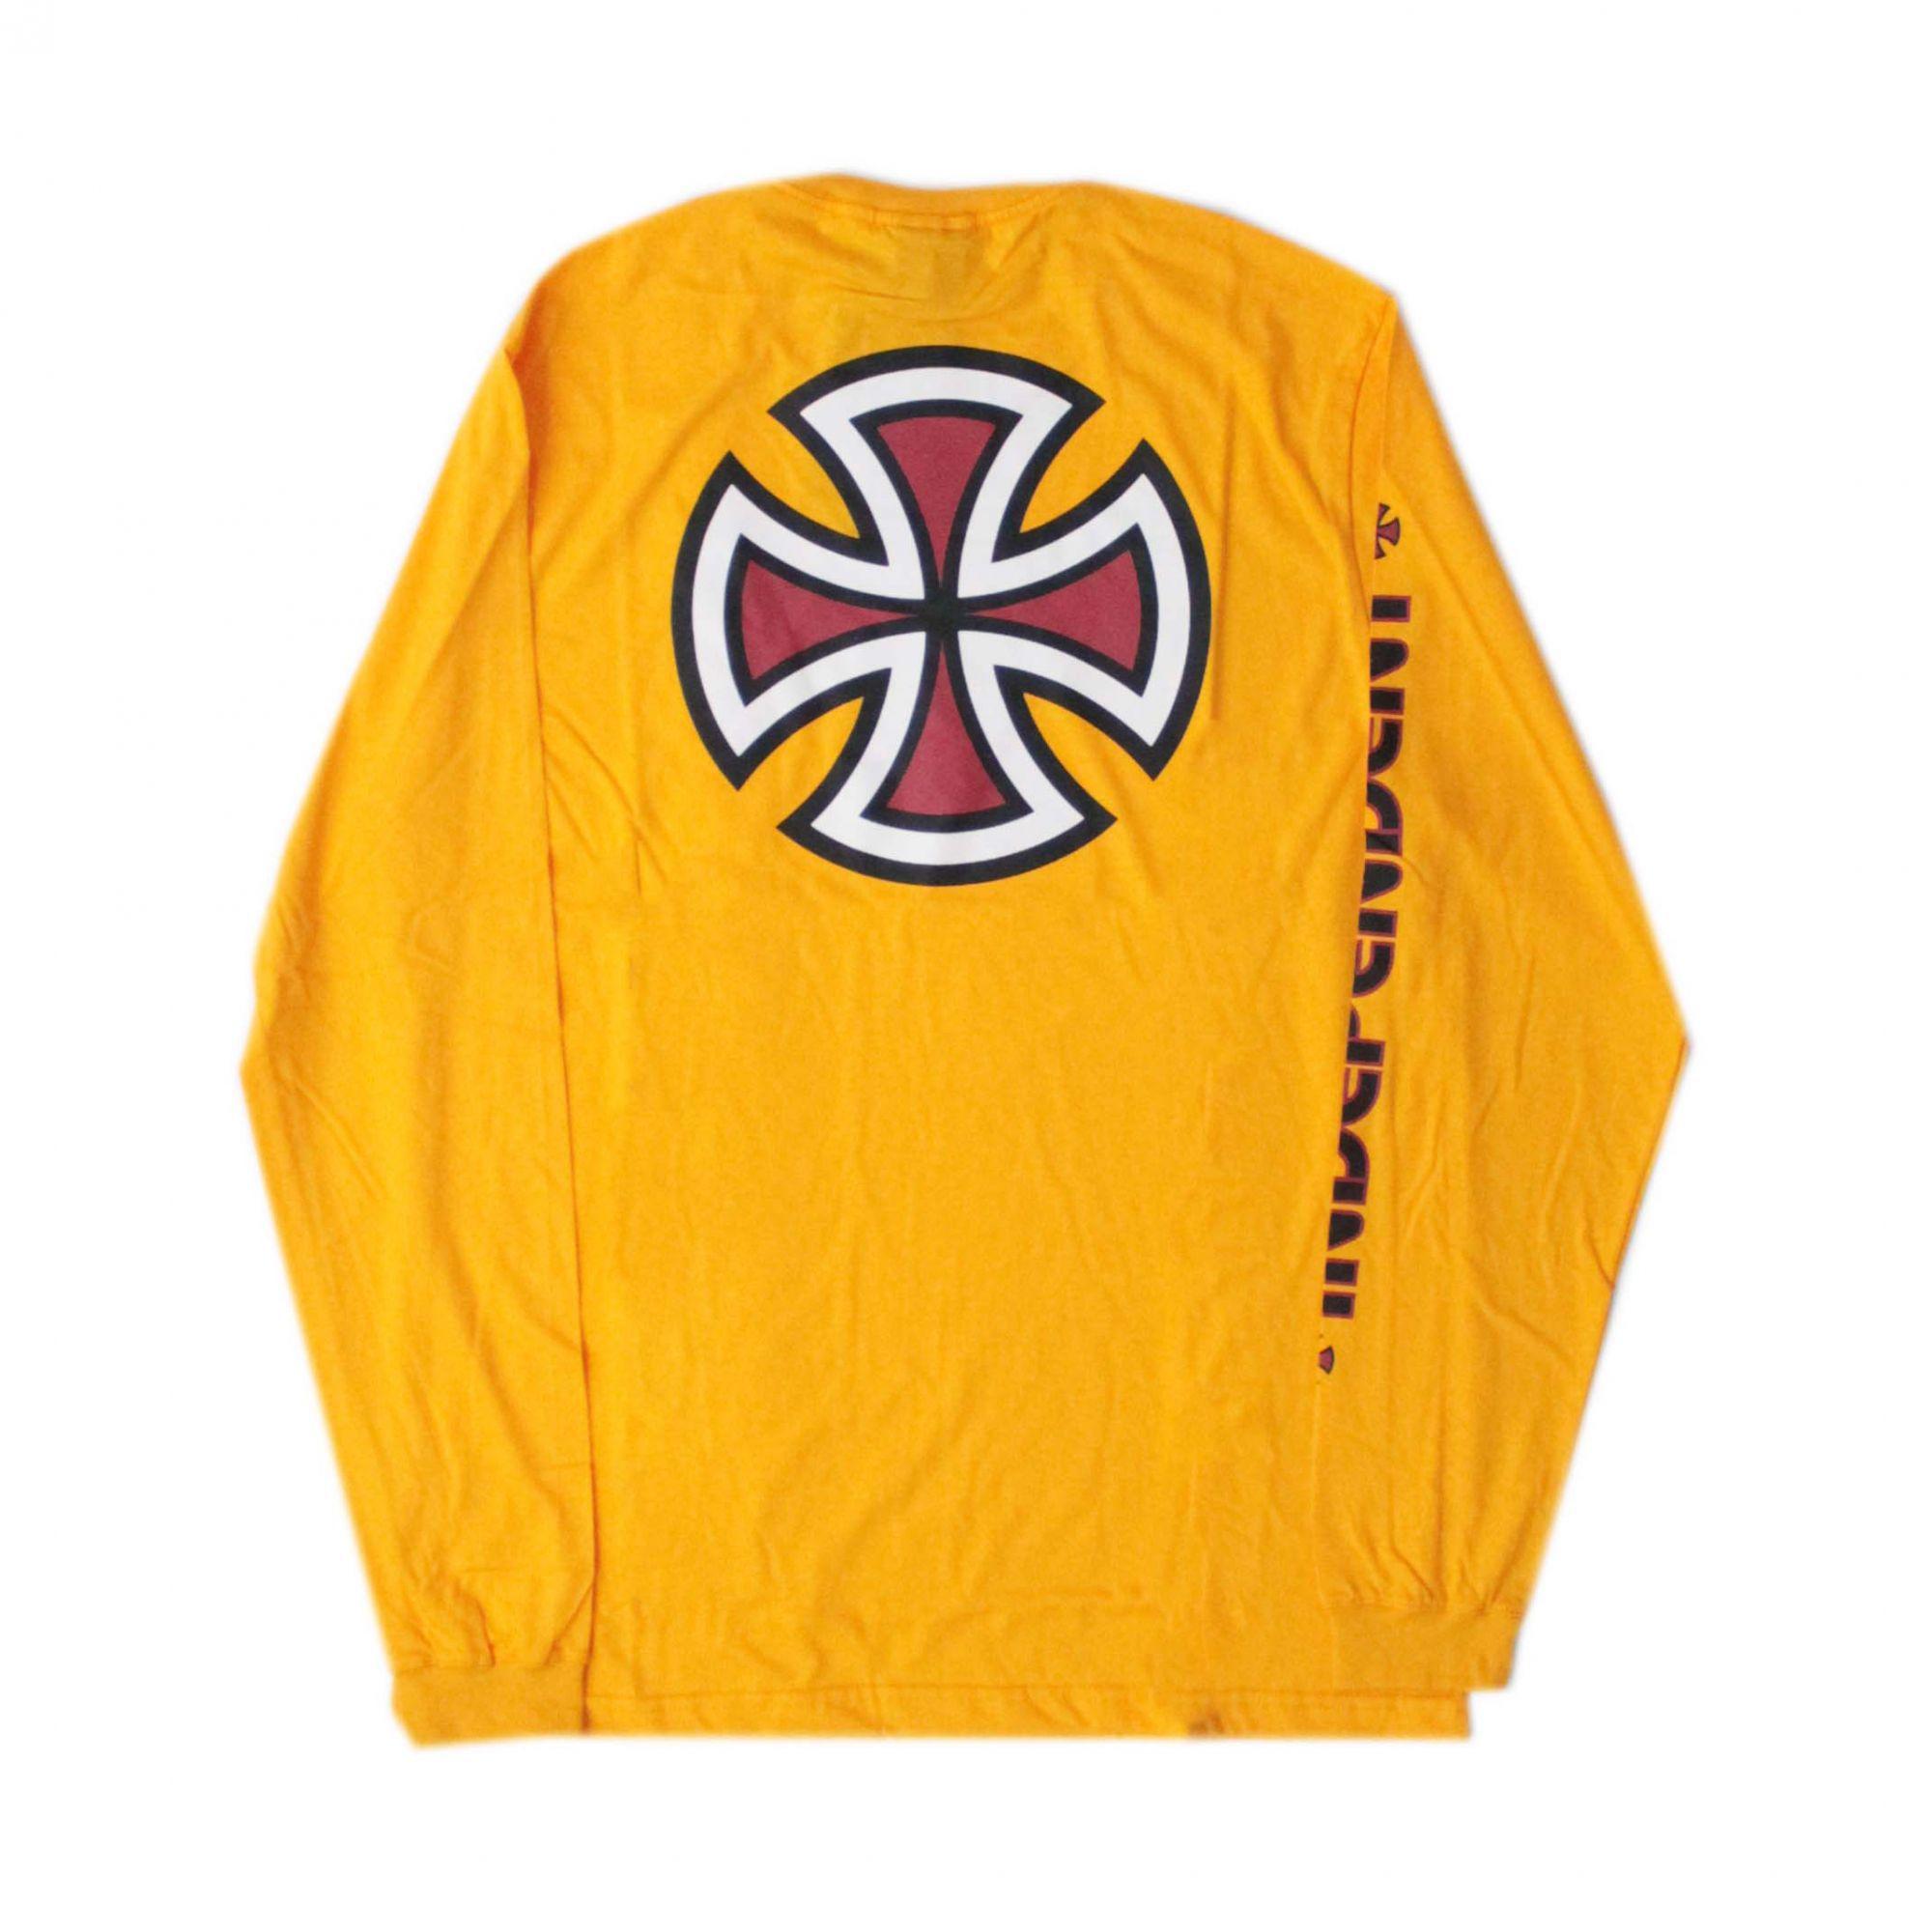 Camiseta Manga Longa Independent Bar Cross - Amarelo